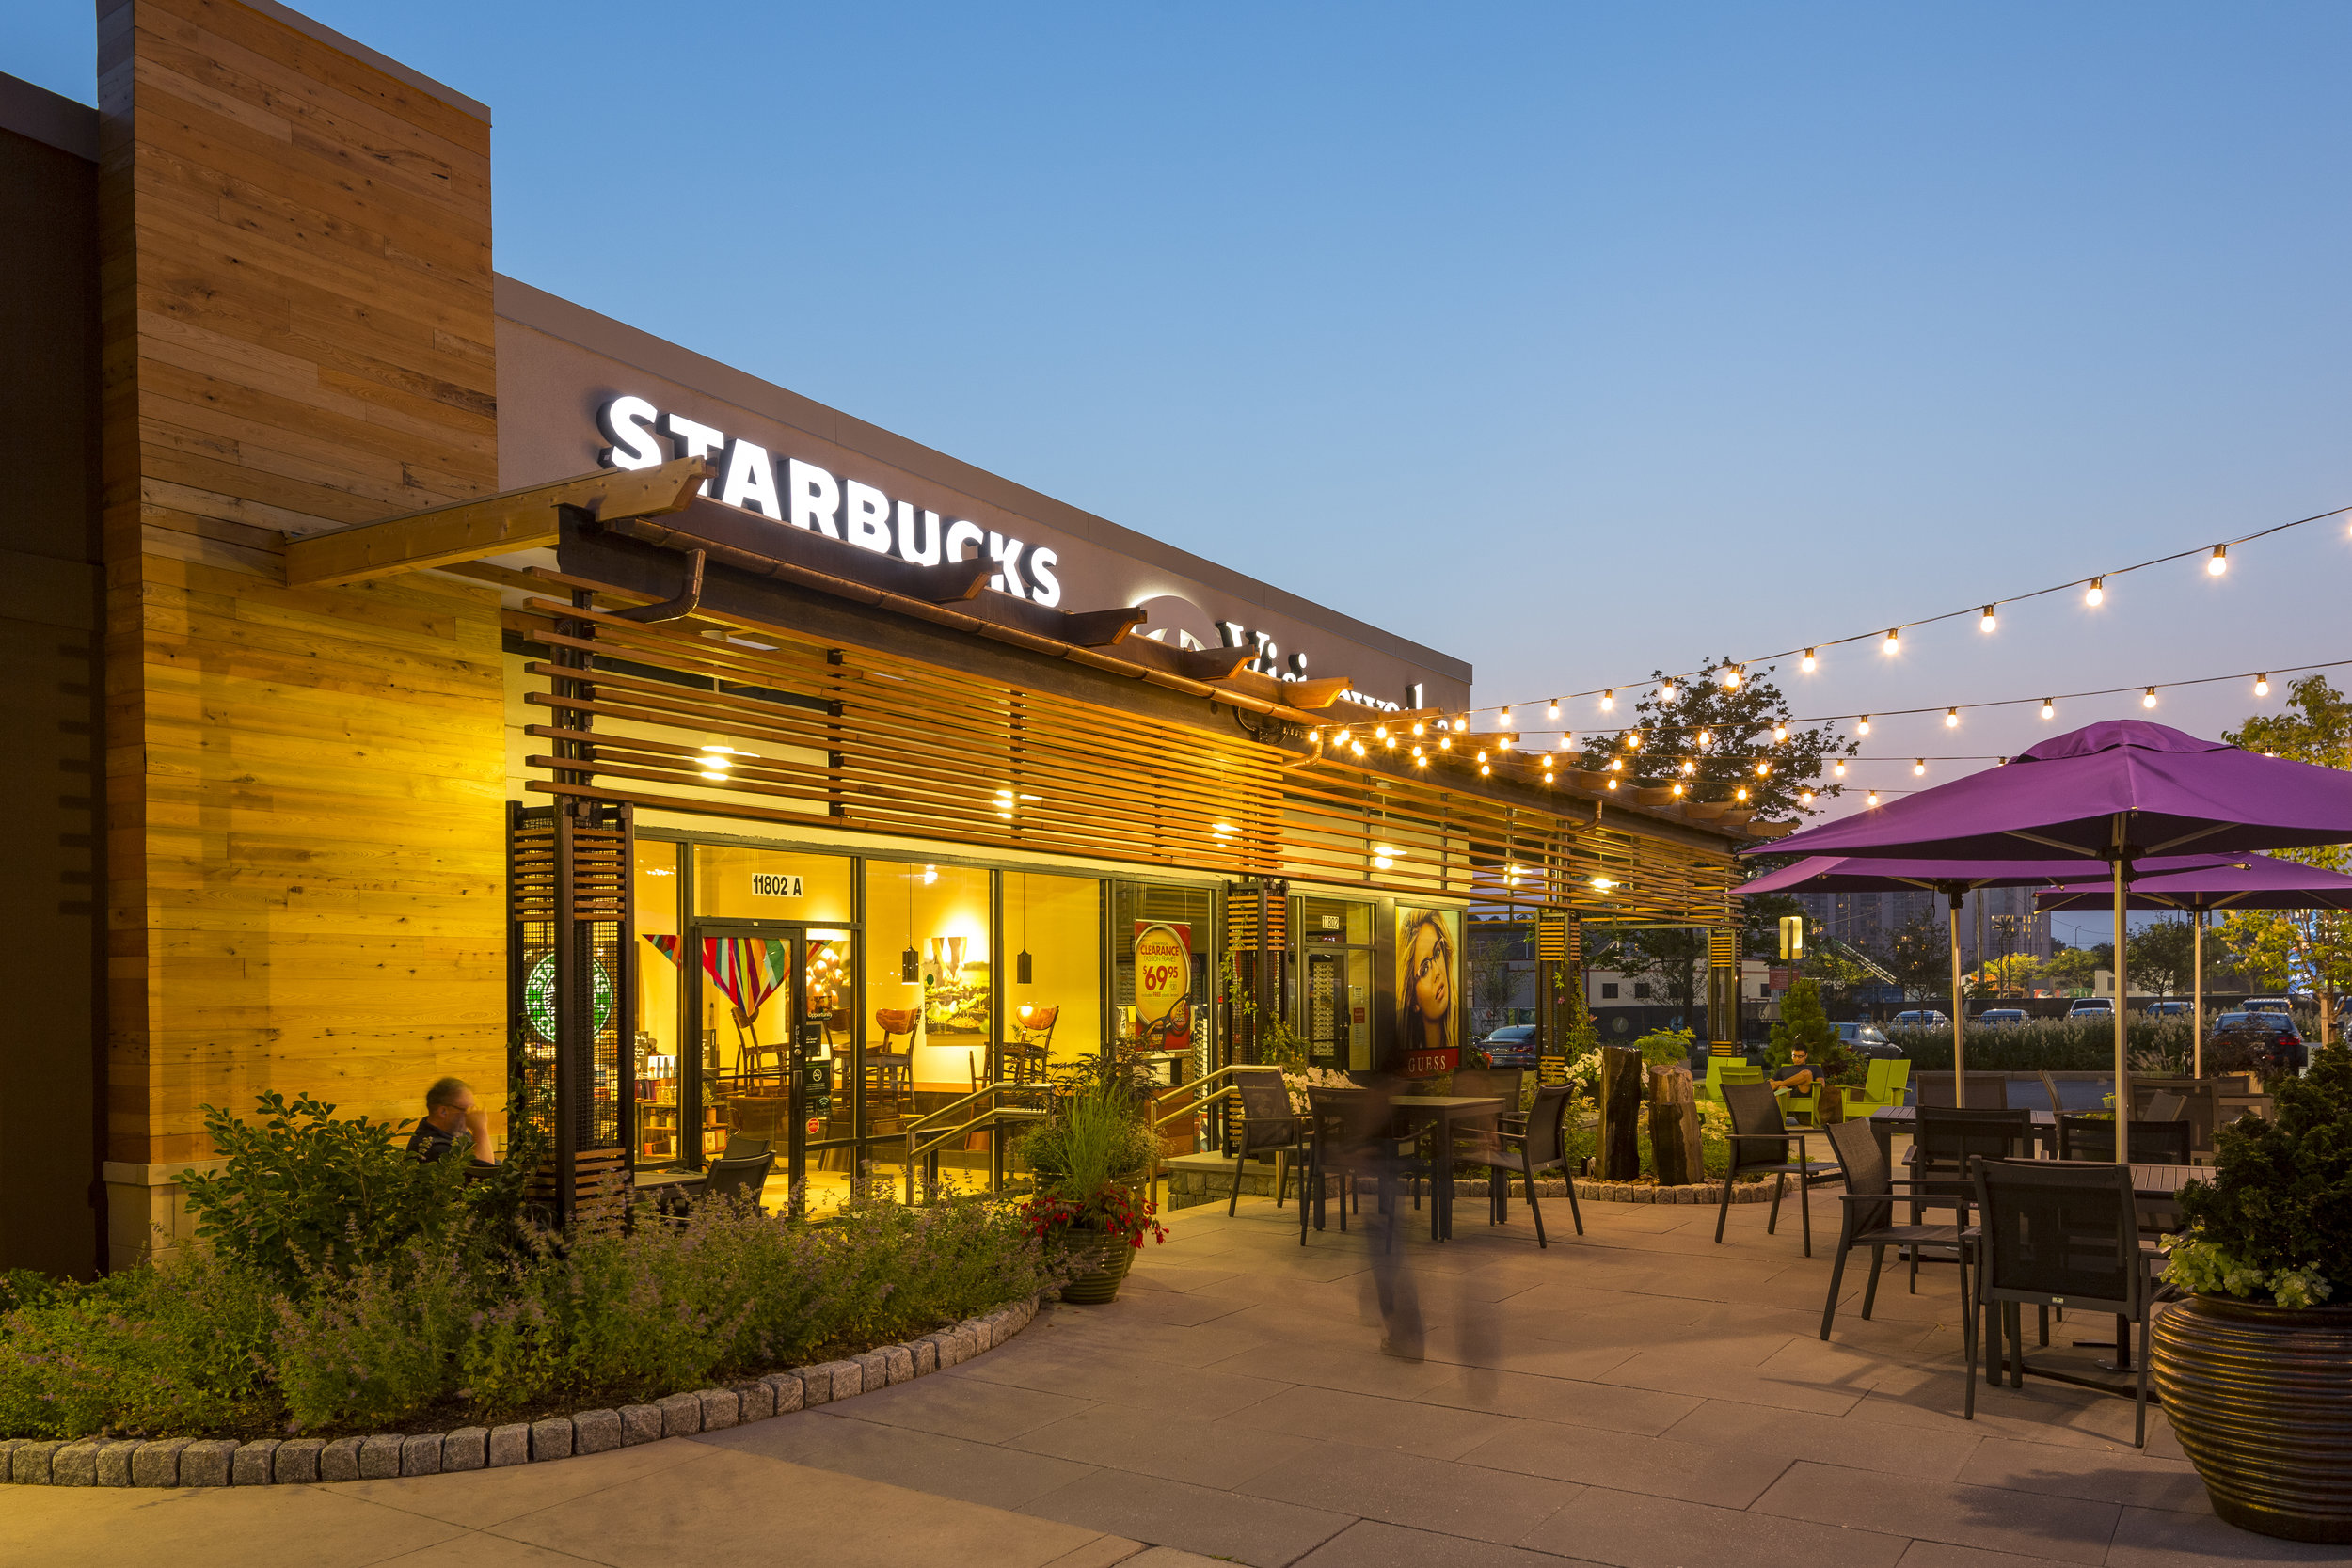 PIKEROSE_Starbucks 04-HY.jpg